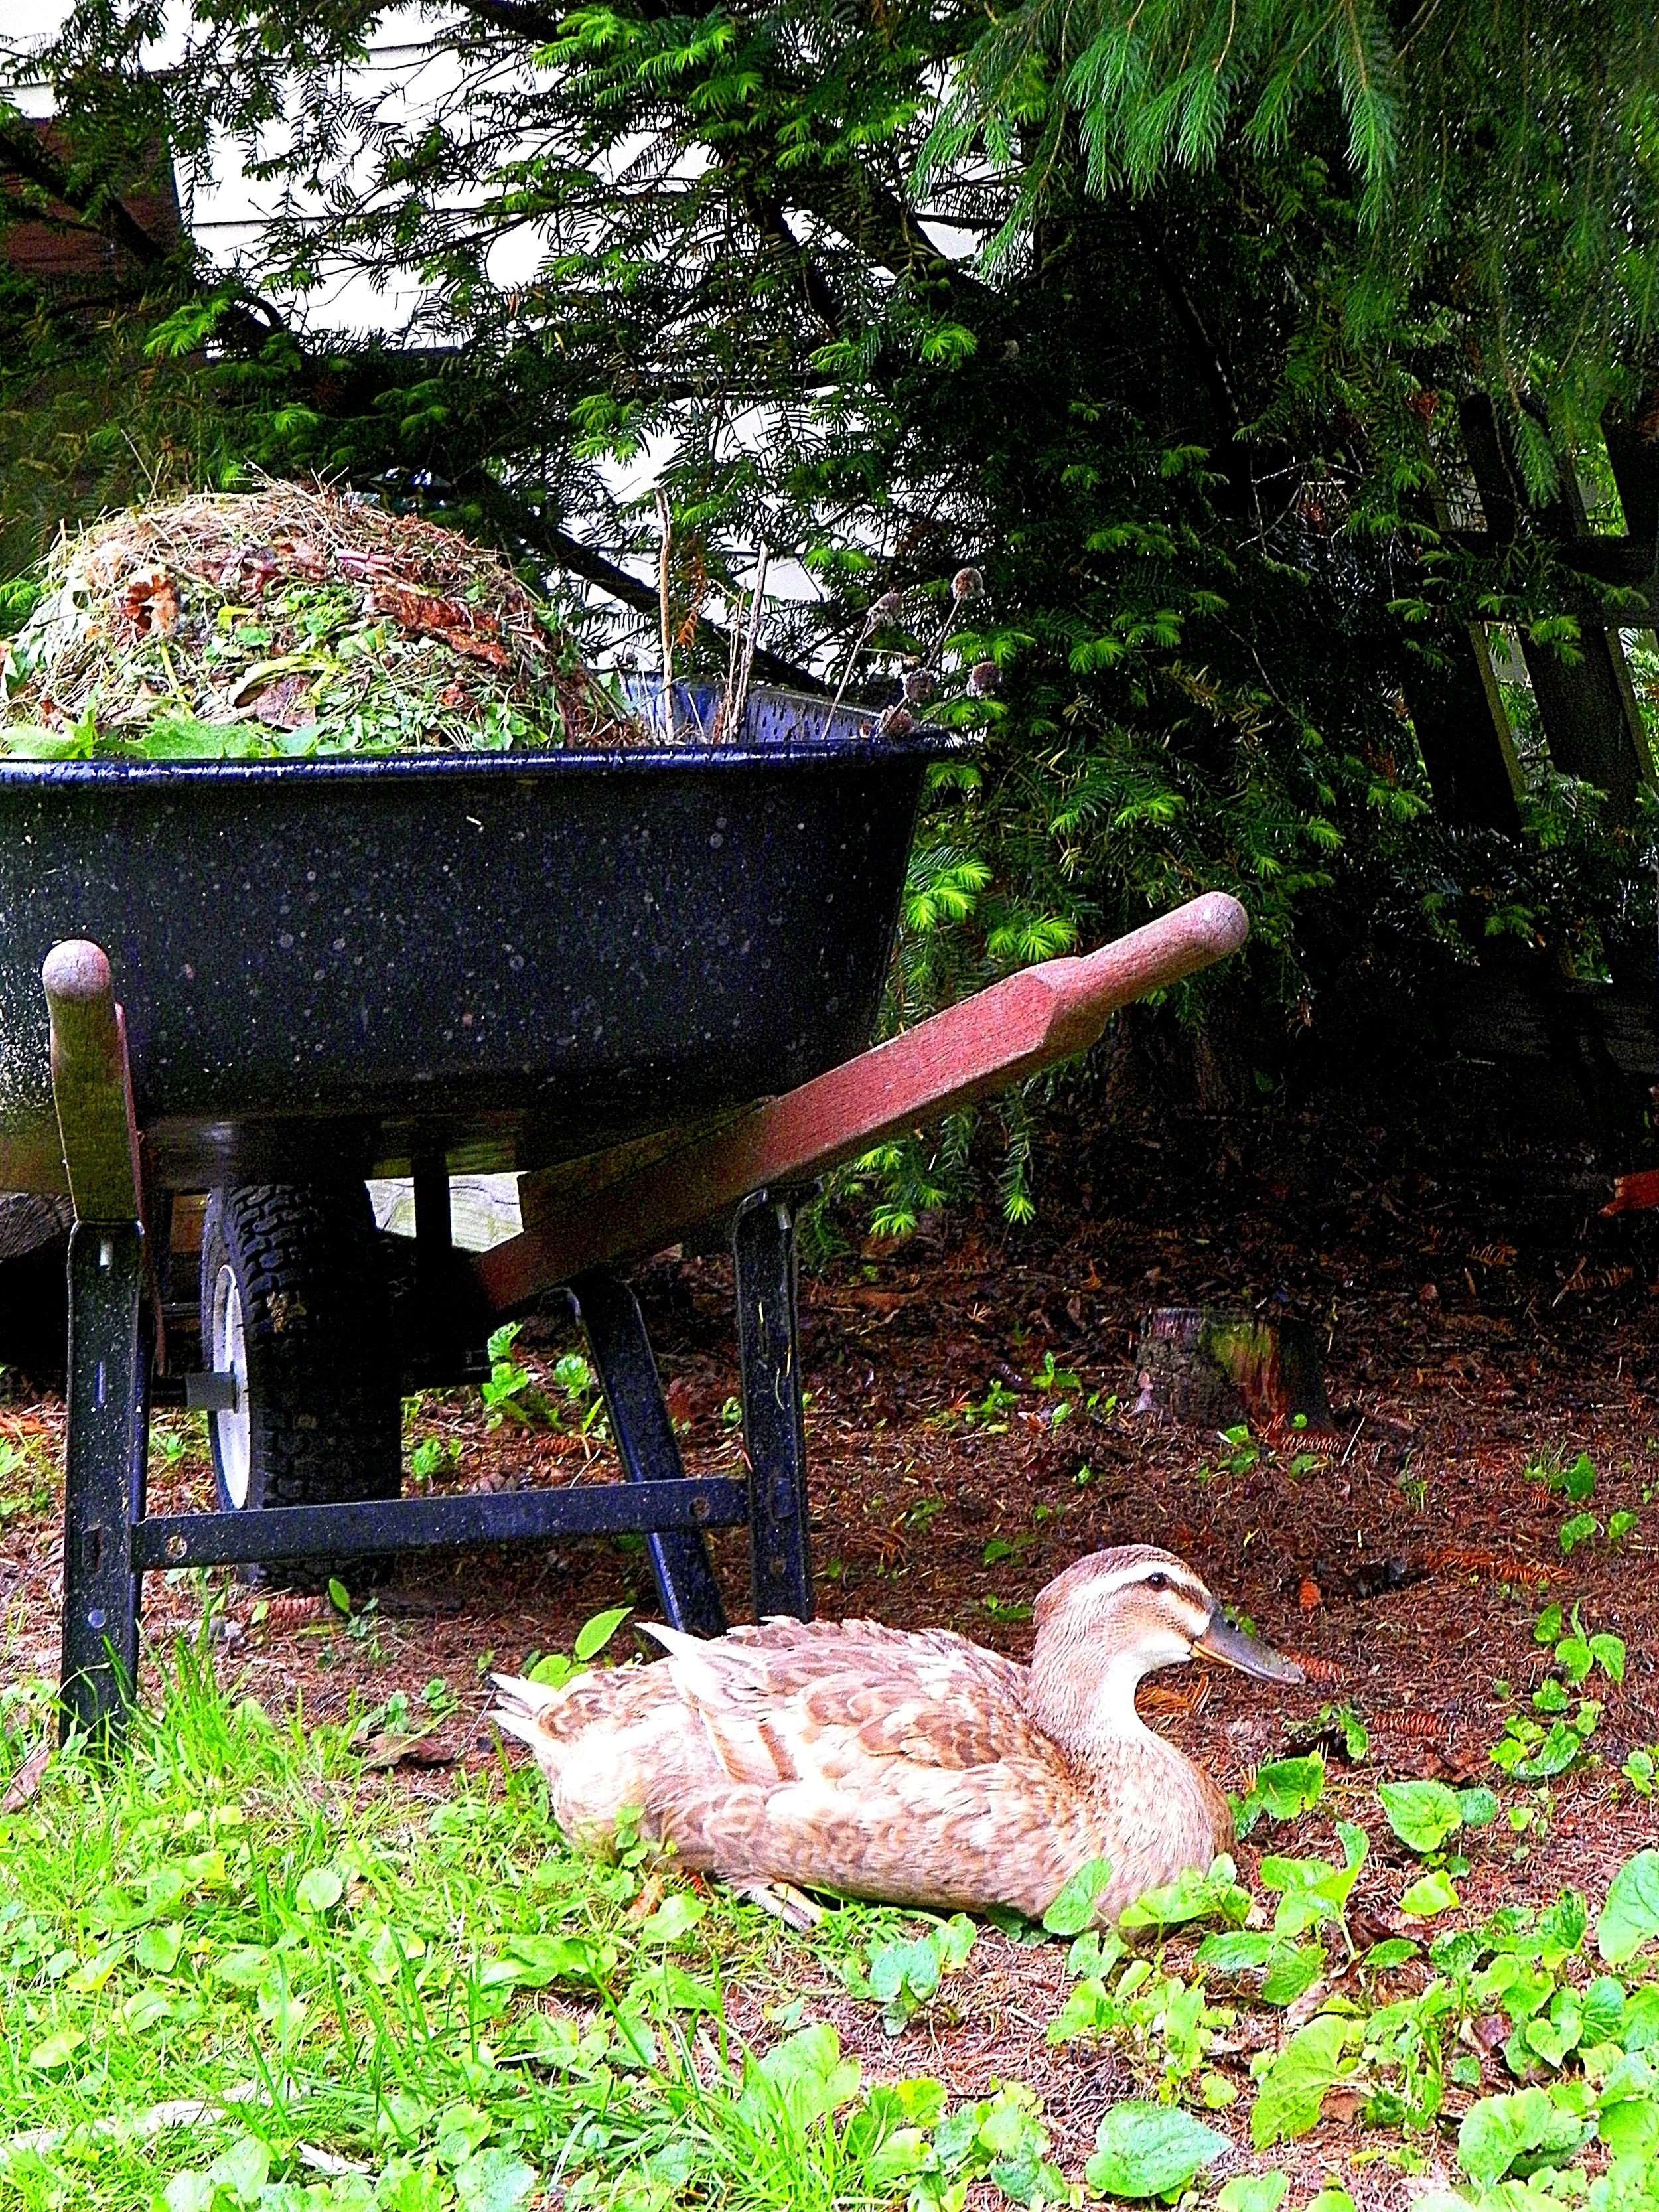 Duck under wheelbarrow